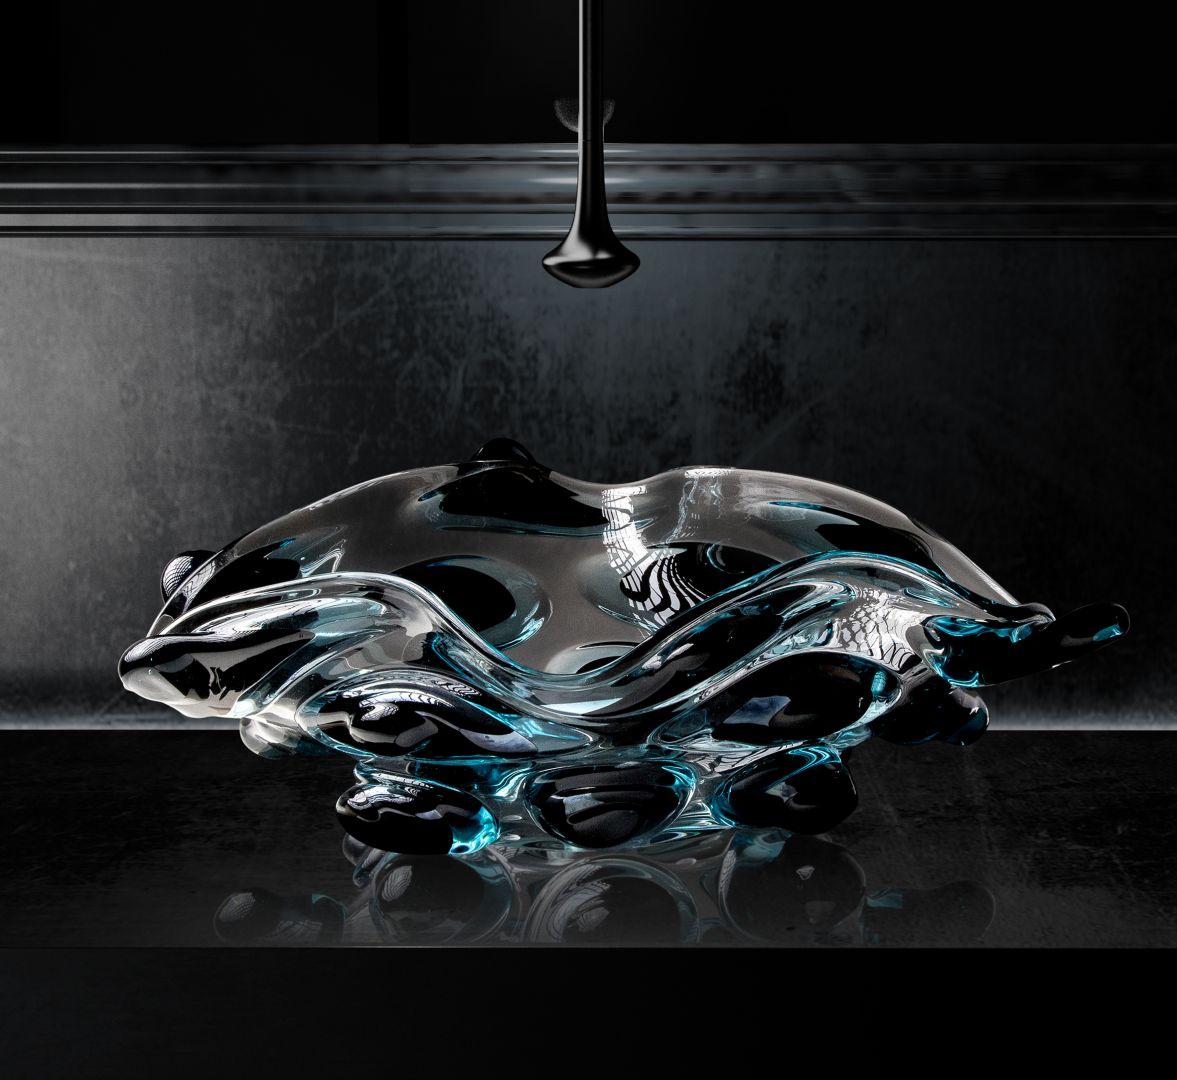 Szklana umywalka Arte 4 z kolekcji Arte Collection marki Glass Design. Fot. Glass Design